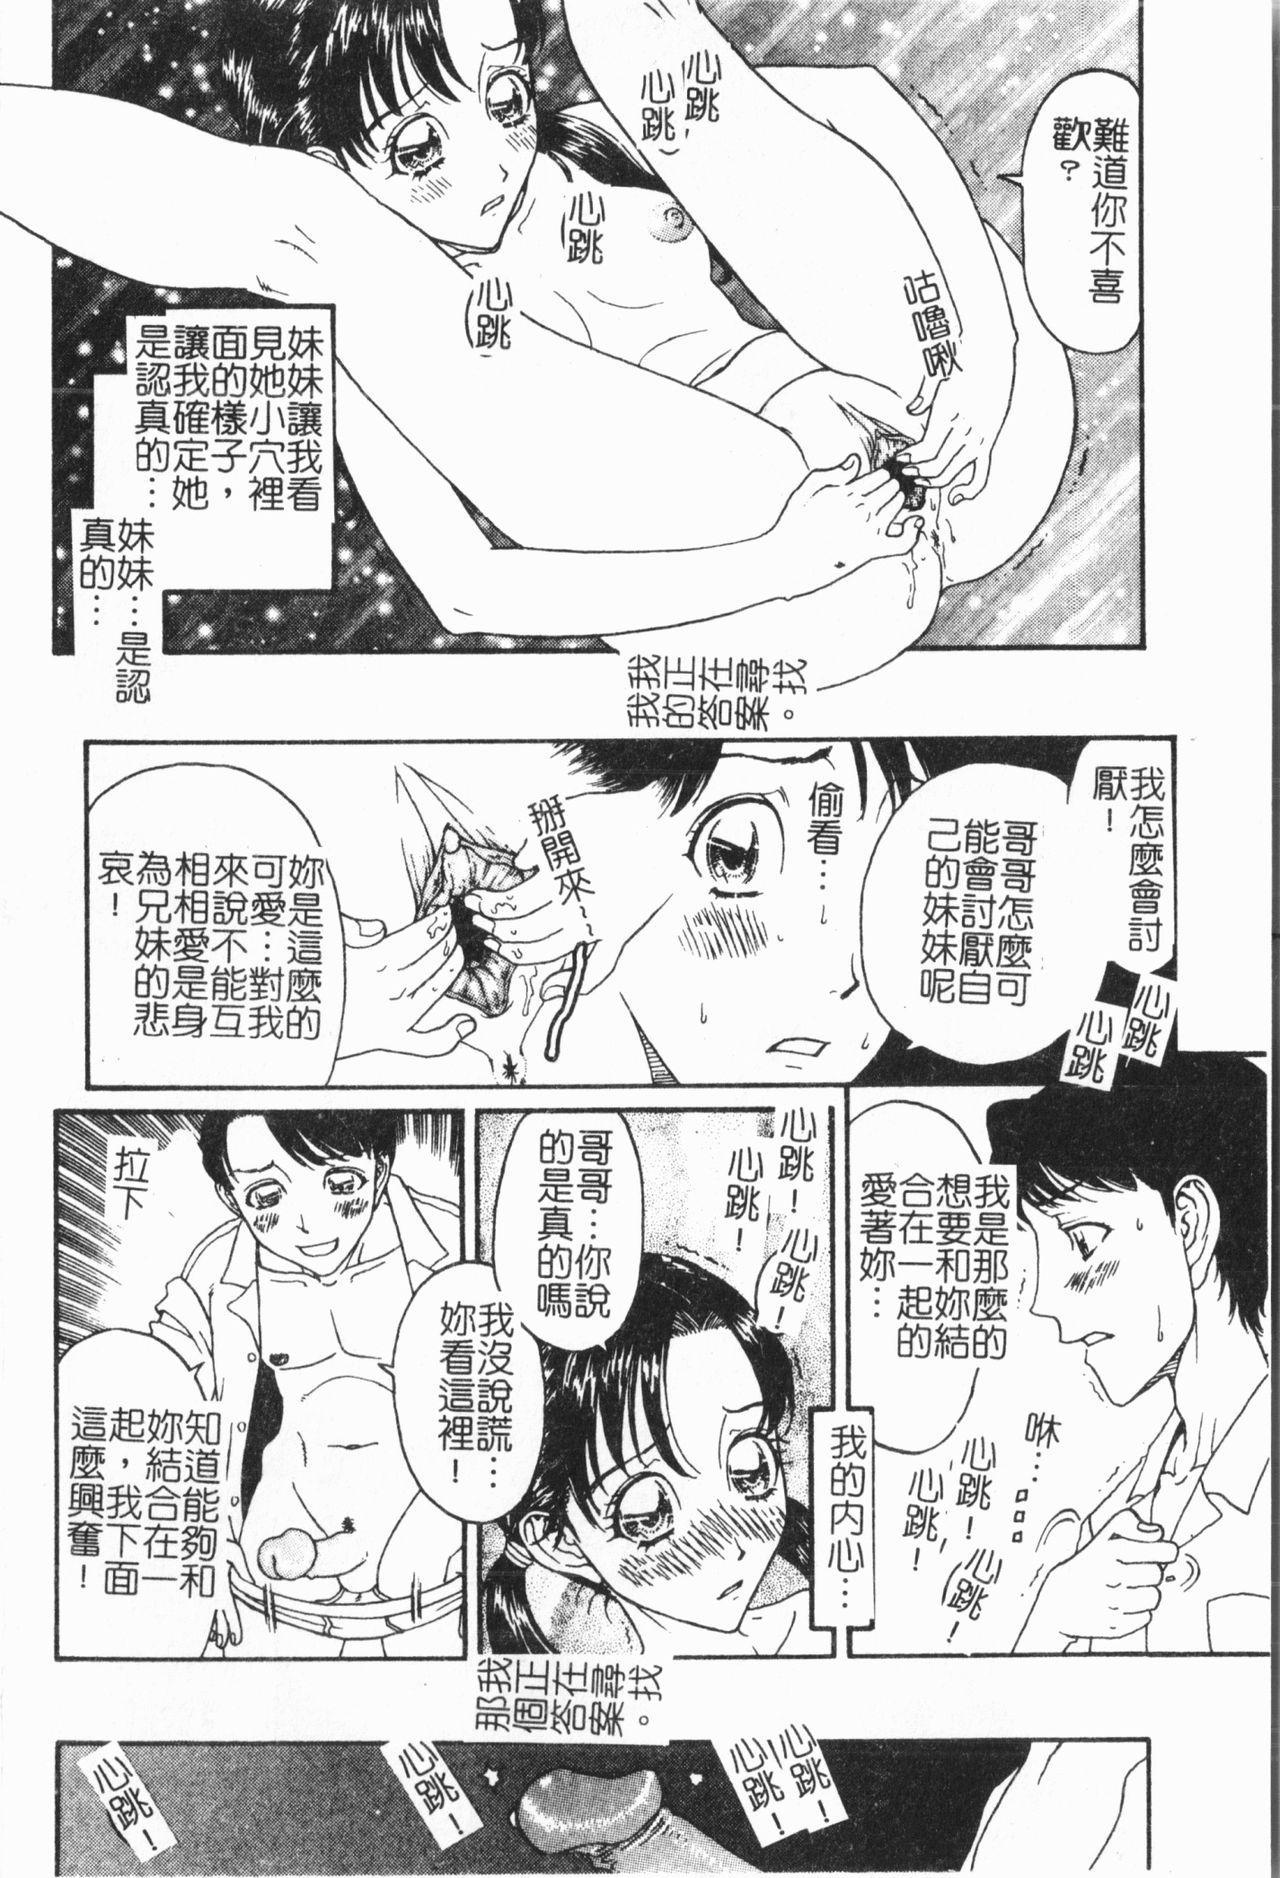 Imouto Koishi 6 84